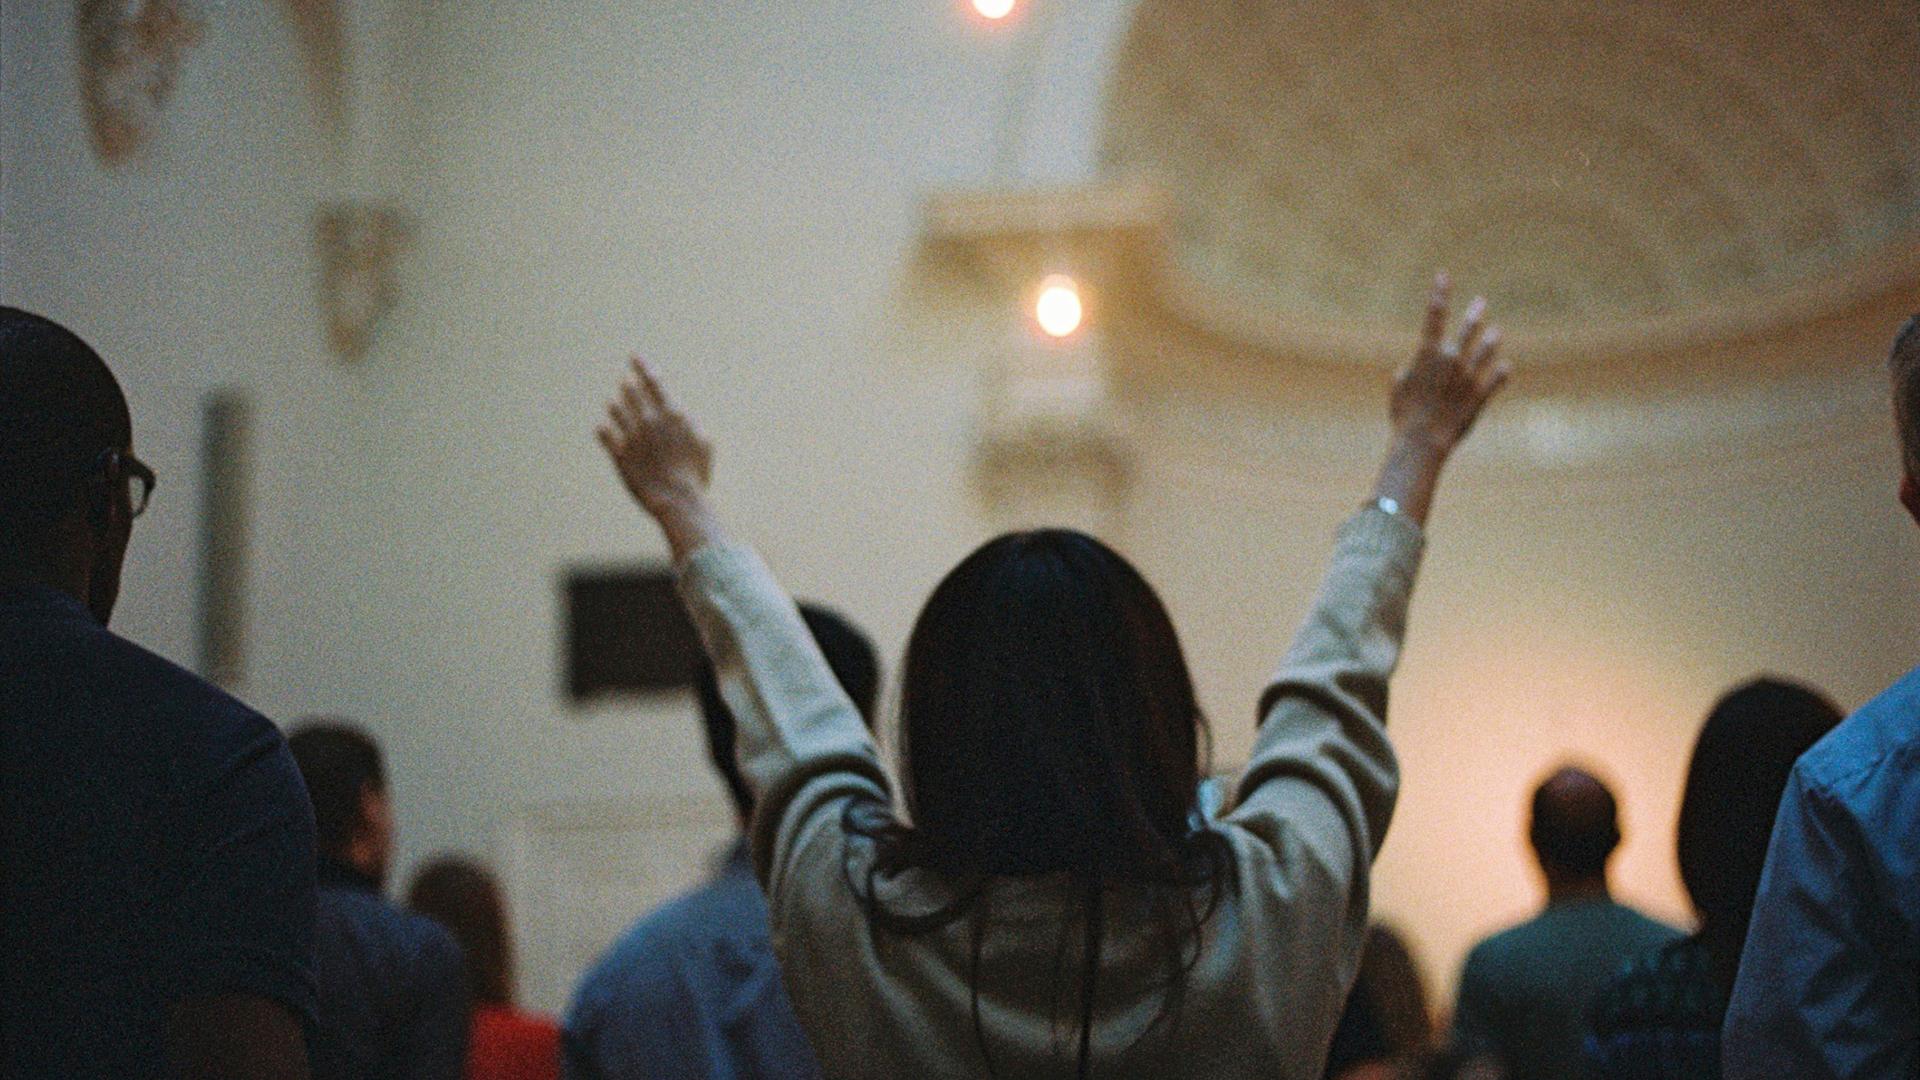 everything-church-02.jpg